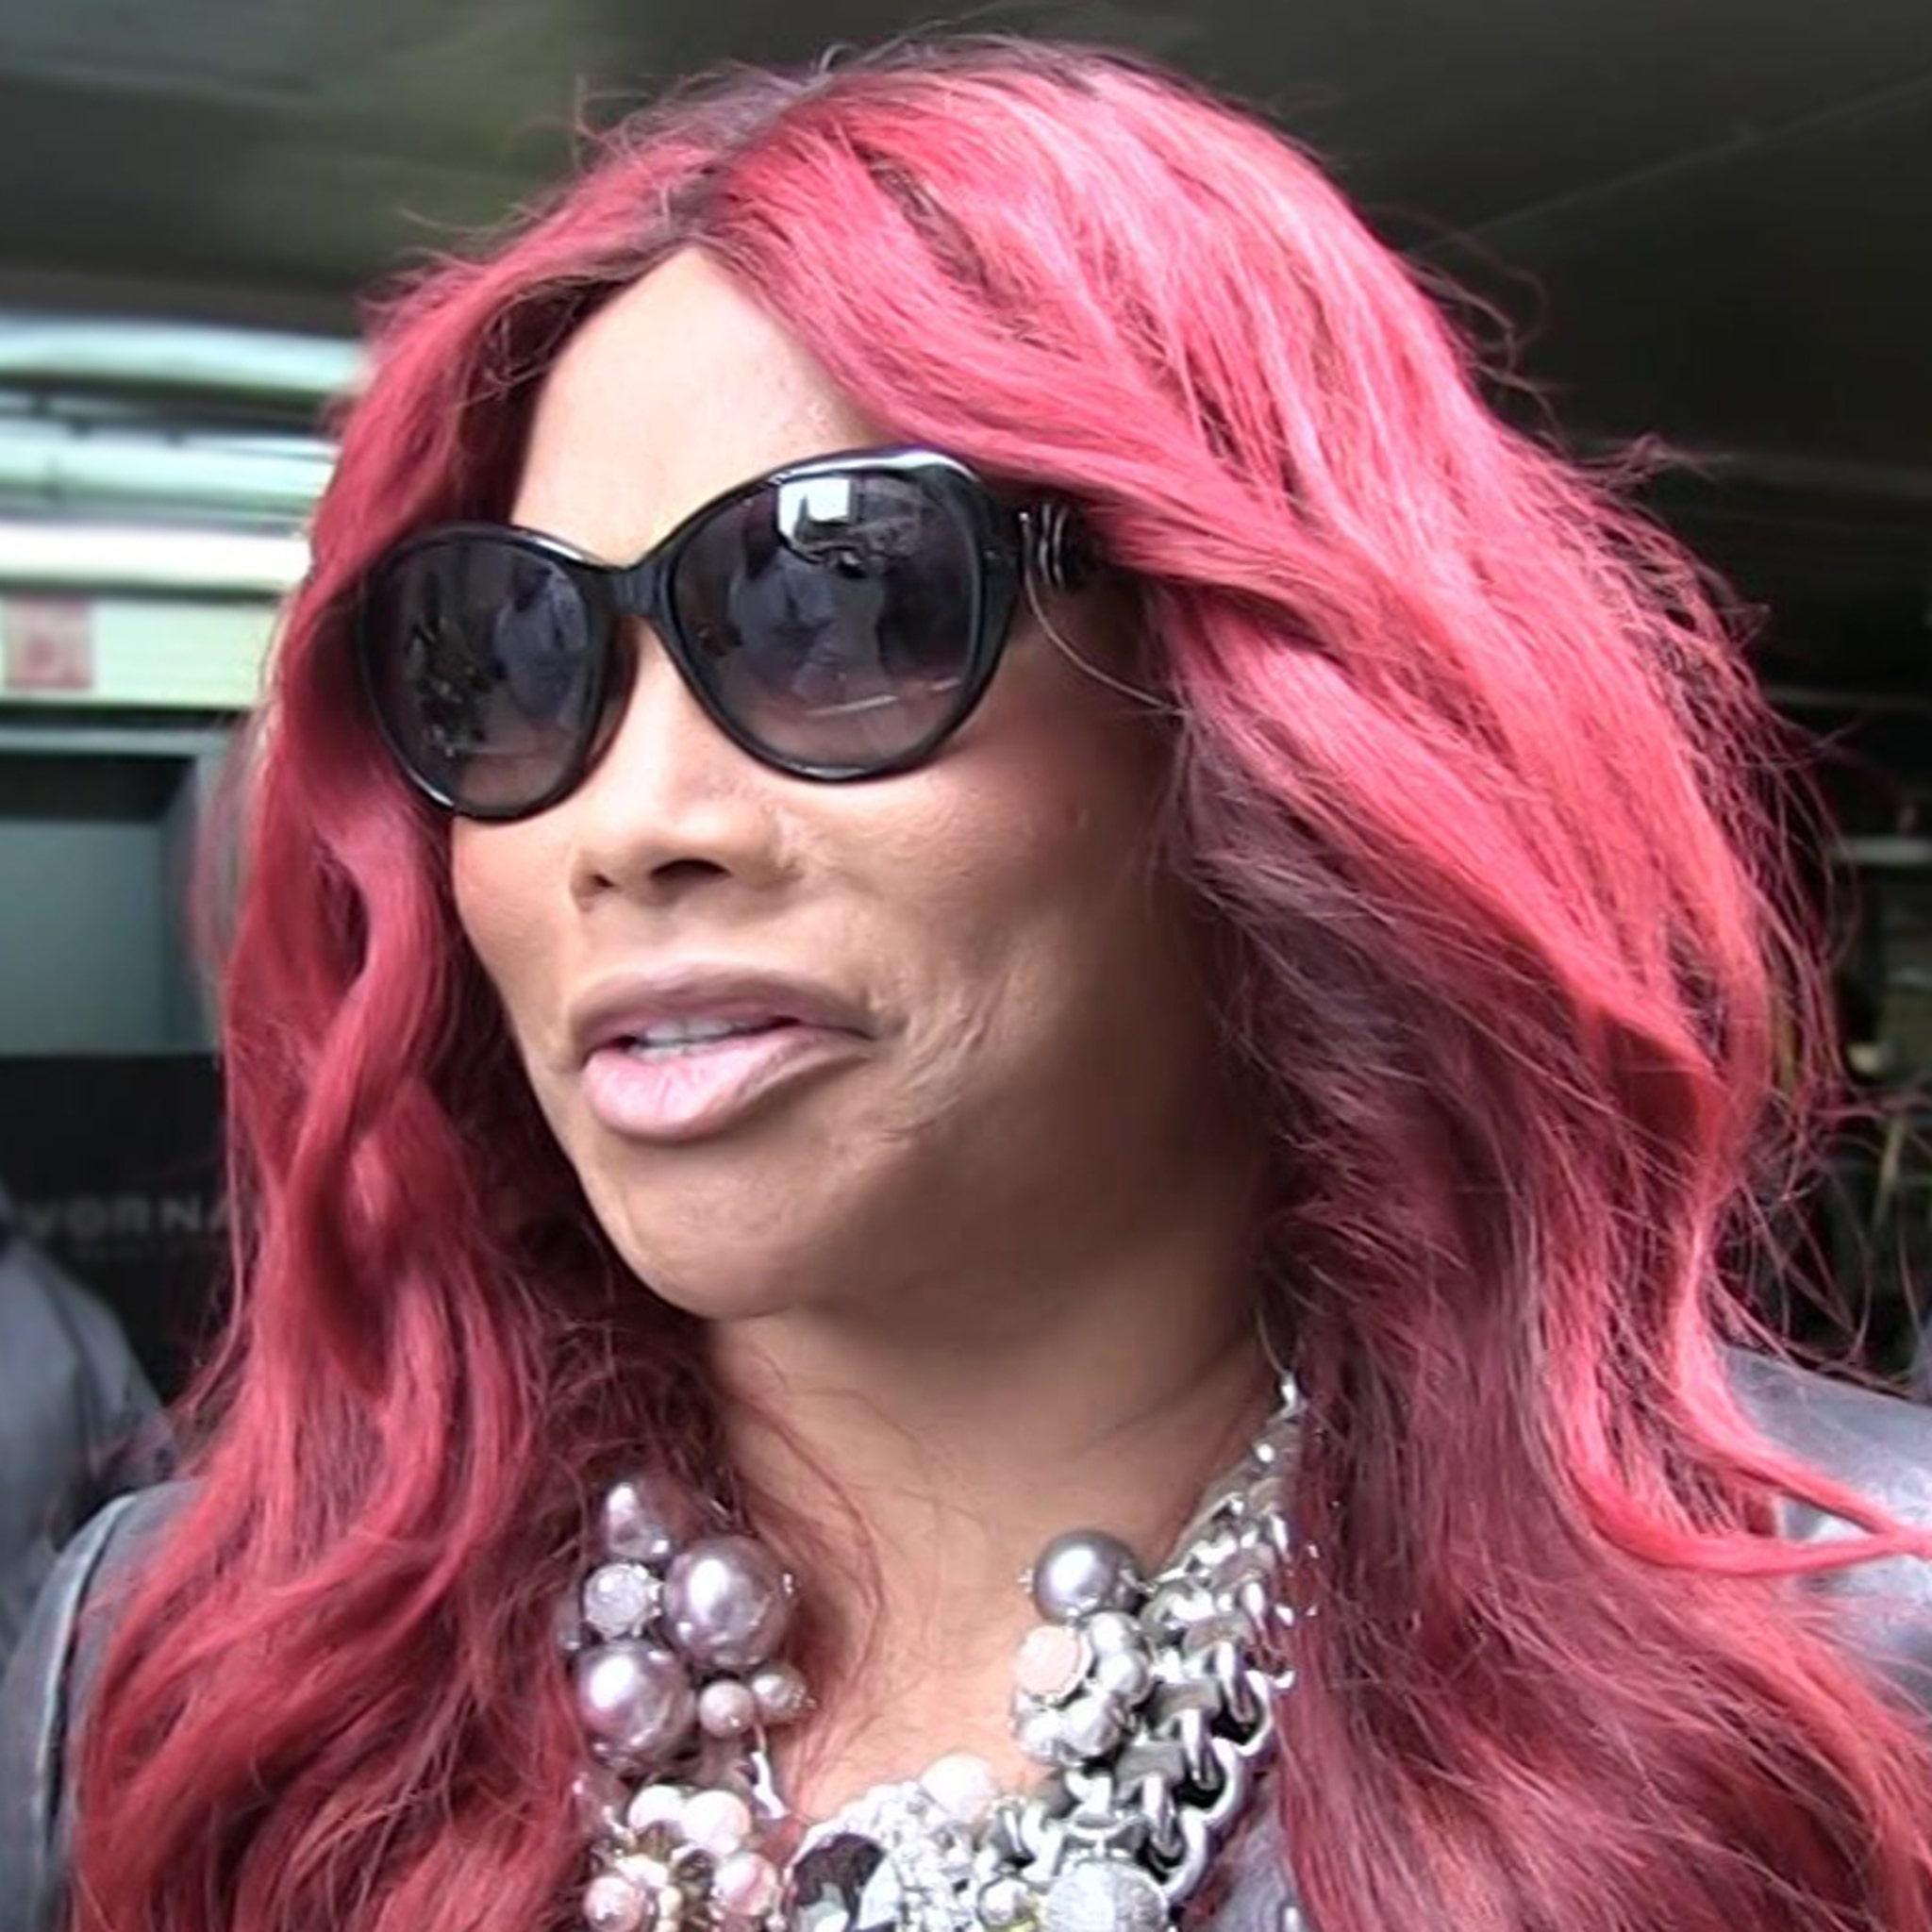 Sandra nackt Denton Pepa Lawsuits: Pepa